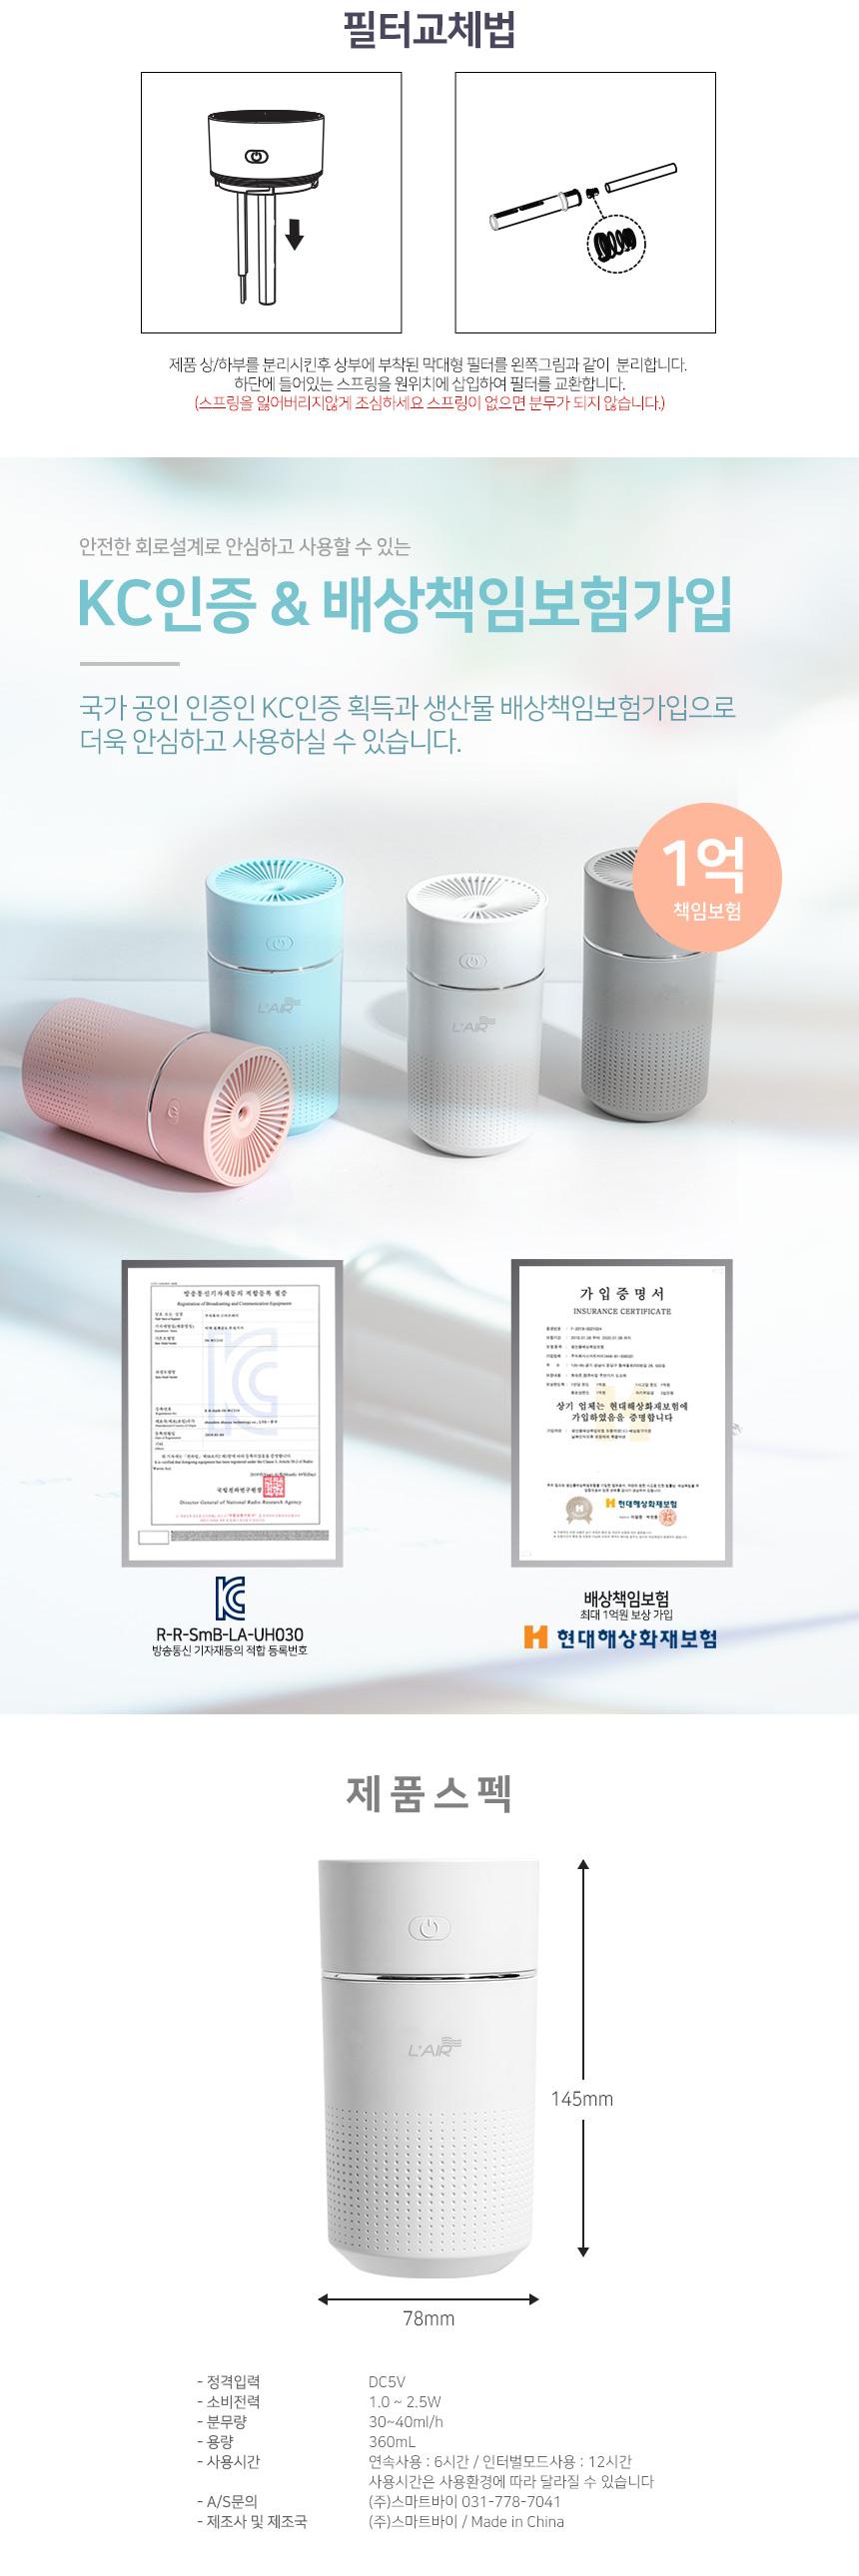 LAir 르에어 TUMBLER USB 가습기 - 아이논, 17,900원, USB 계절가전, 가습기